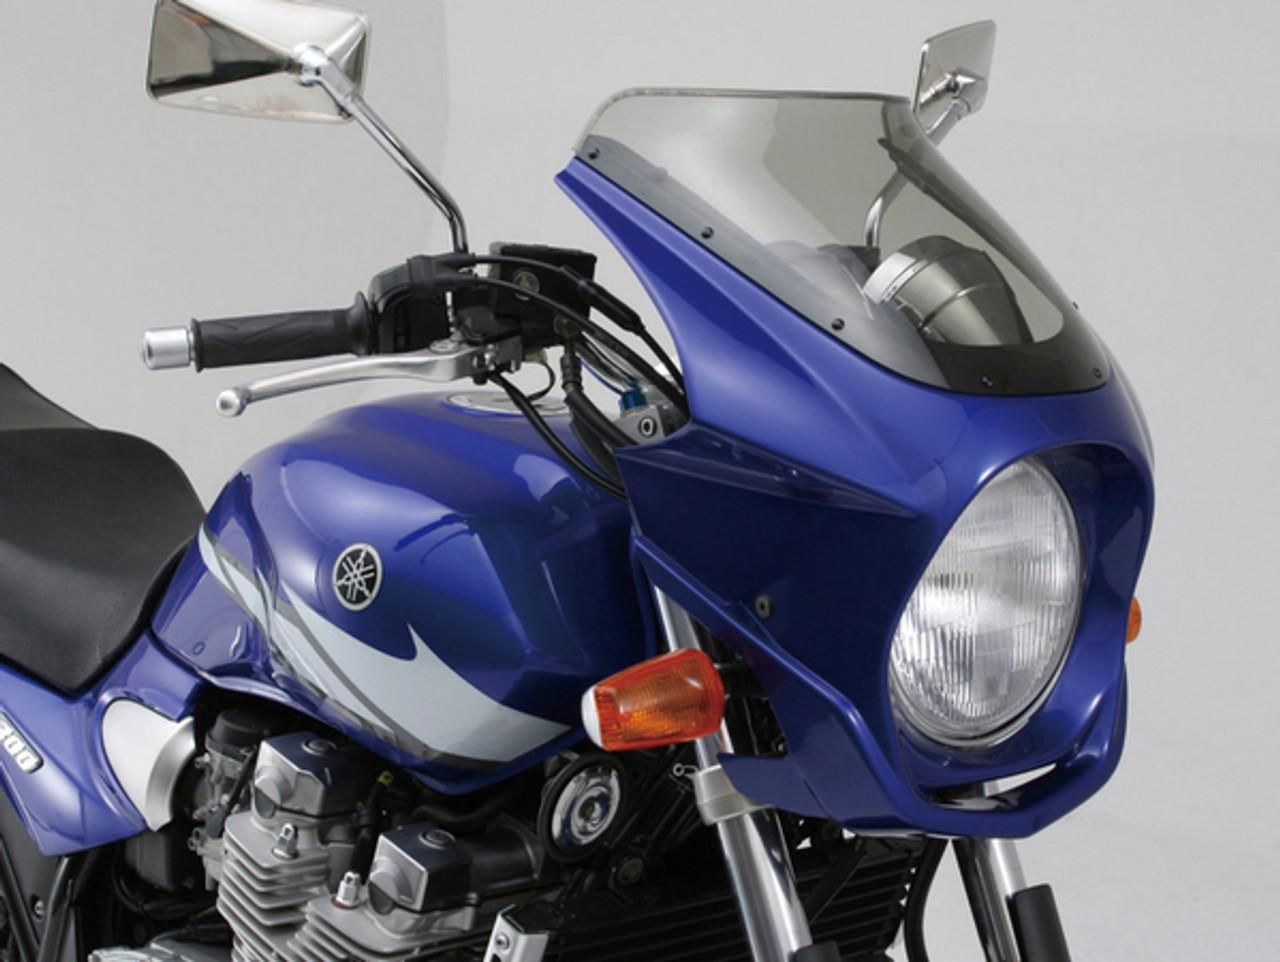 Daytona AR Breaker, Bikini Cowl (With Bracket), Yamaha XJR1300 2000-2005